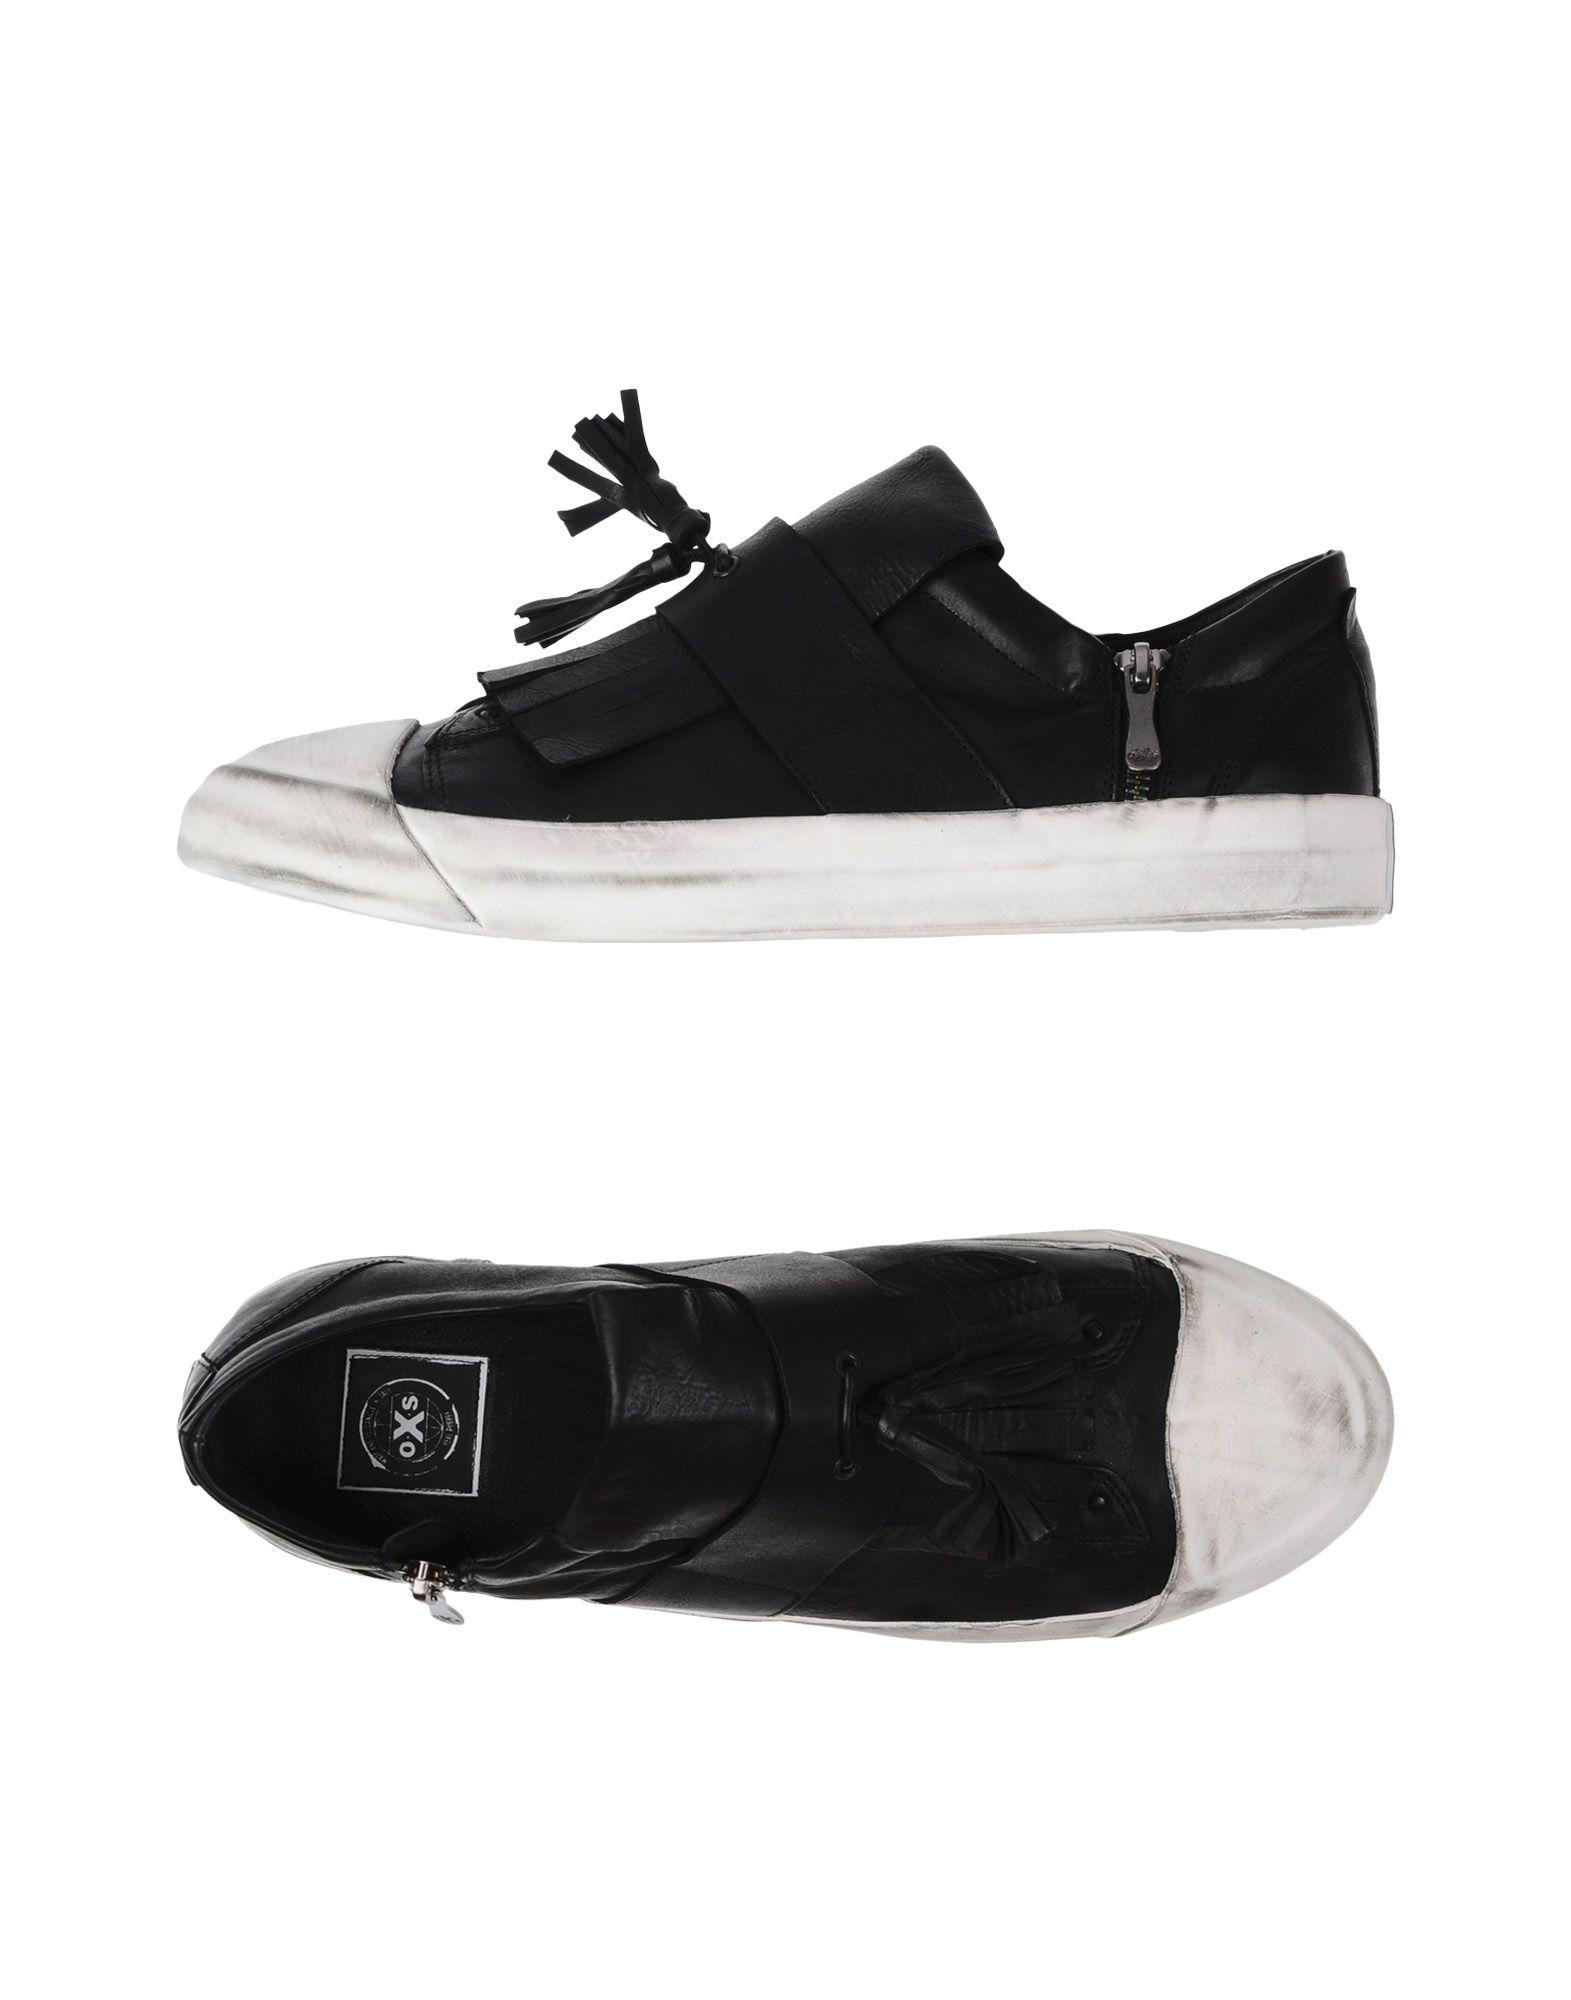 O.X.S. Sneakers Herren  11278240LB Gute Qualität beliebte Schuhe